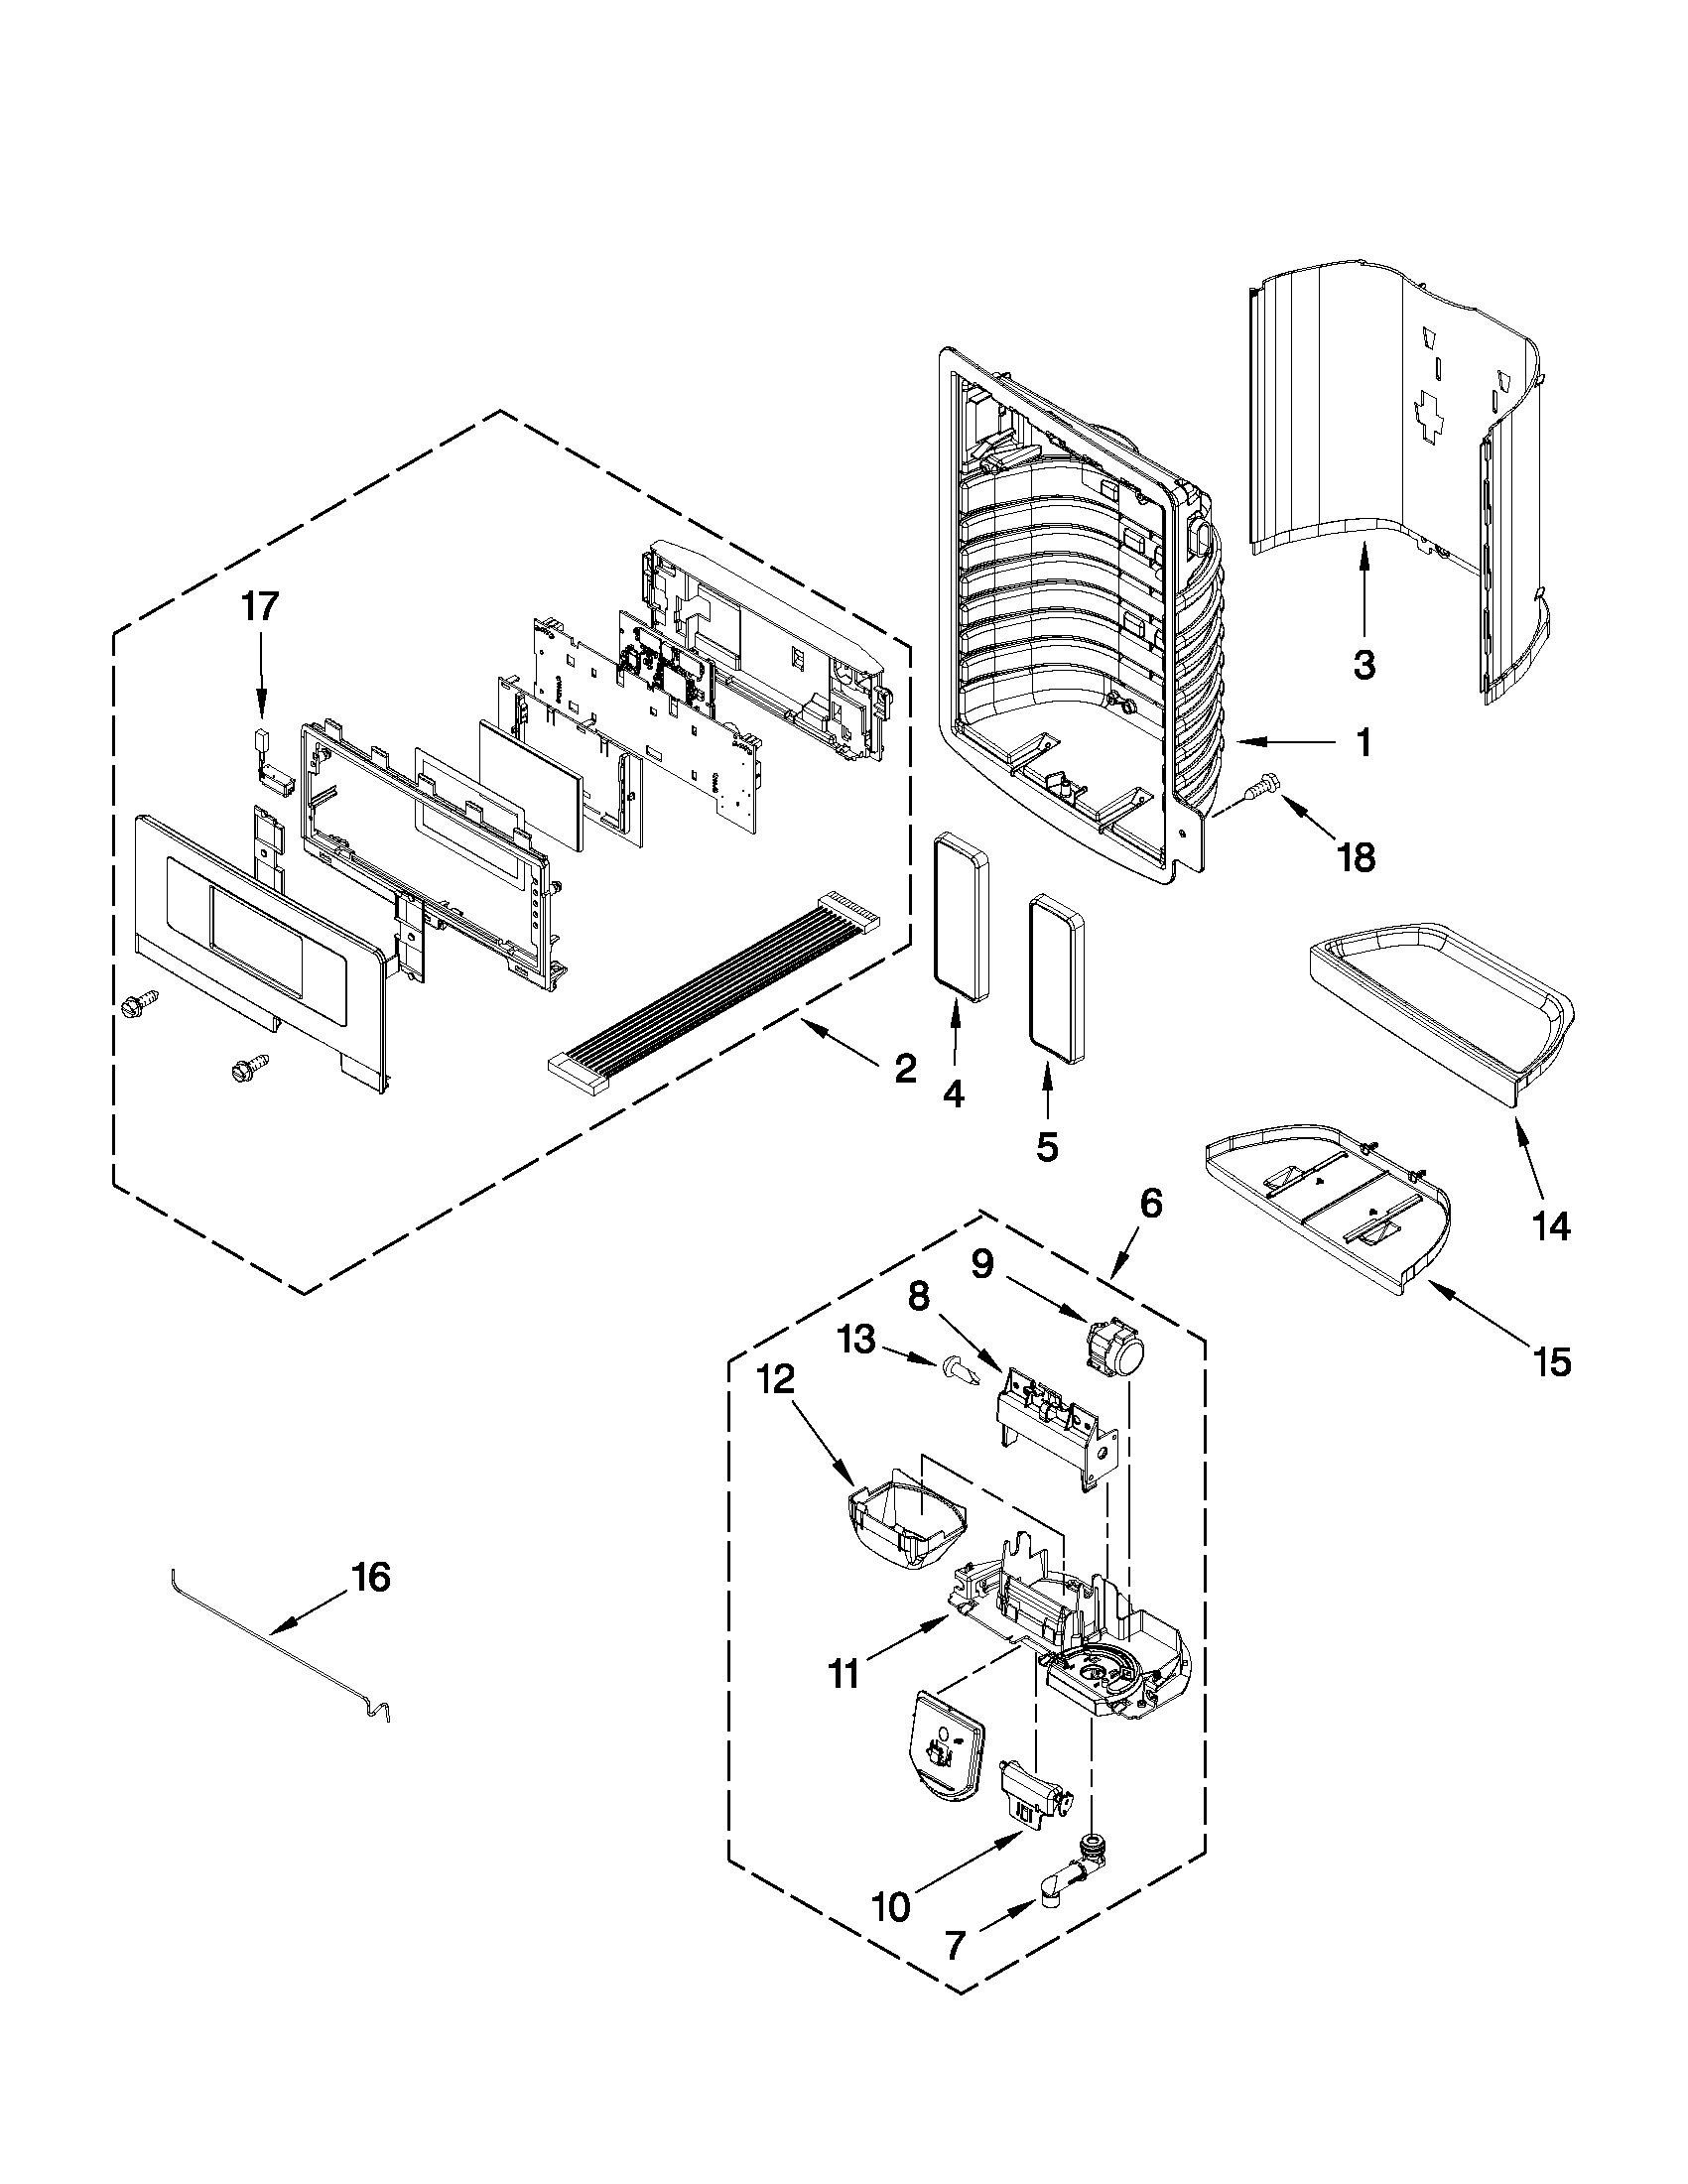 Maytag model MFI2665XEW3 bottom-mount refrigerator genuine